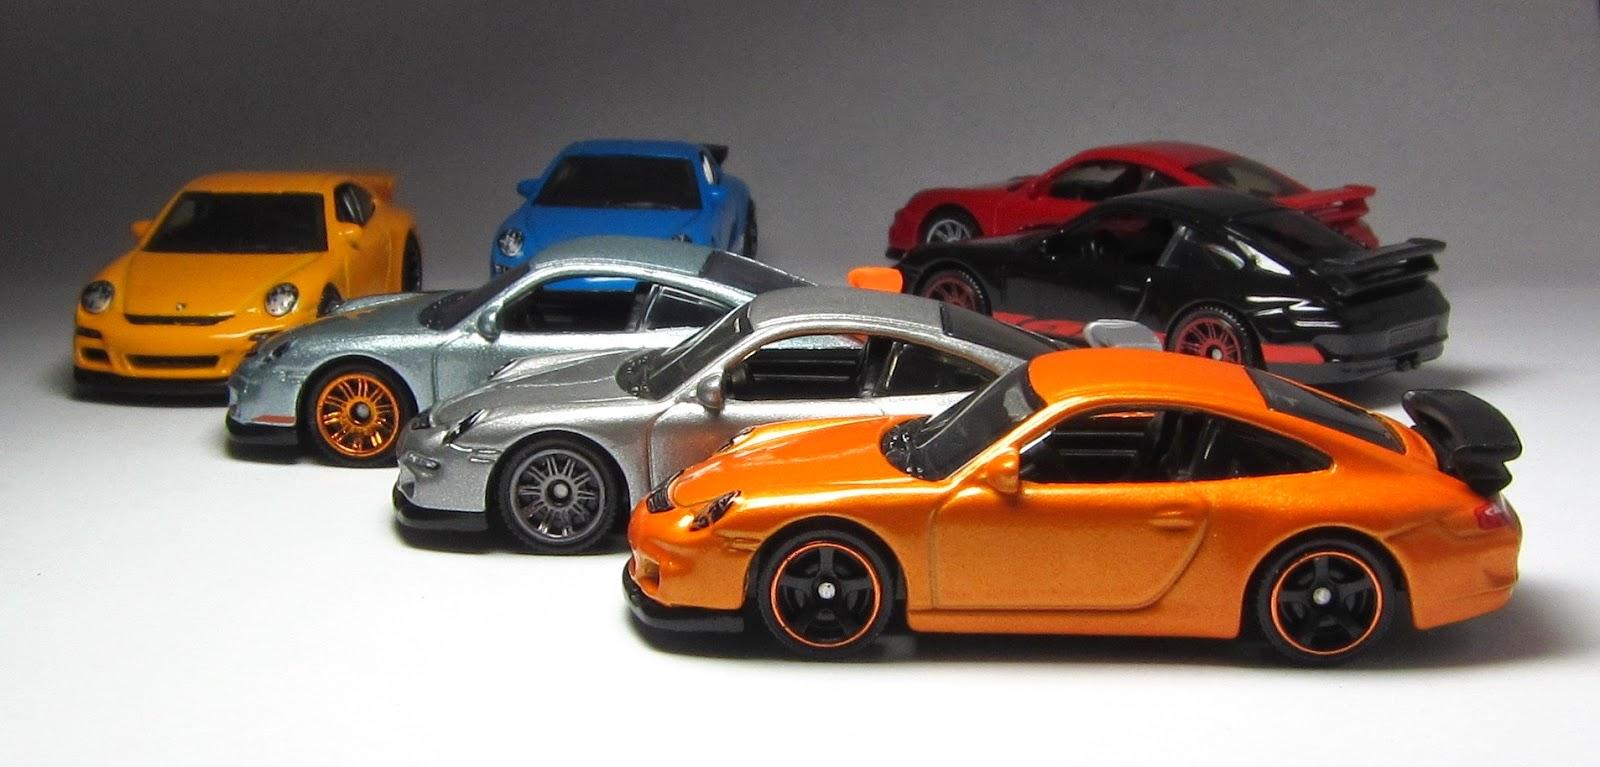 The Last Golden Age of Matchbox: Porsche 911 GT3... - AUTOCAR ... Porsche Throughout The Ages on porsche cayenne, porsche models, porsche gt, porsche girl, porsche gt4, porsche vs corvette, porsche 9ff, porsche carrera, porsche spyder, porsche panamera, porsche boxster, porsche 2 seater, porsche history,